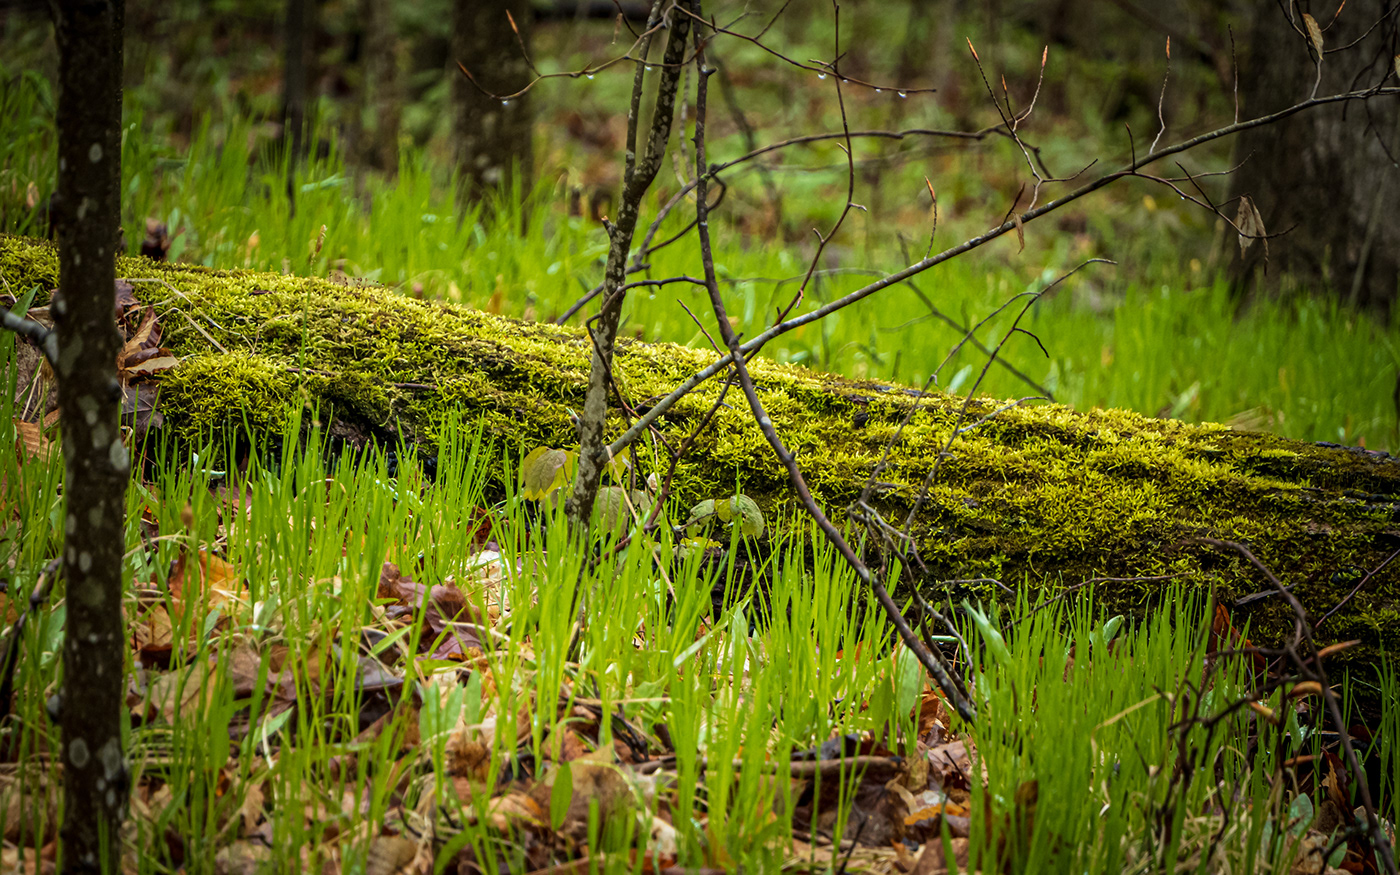 Cottage forest Kawartha landscapes Nature overcast plants spring trees